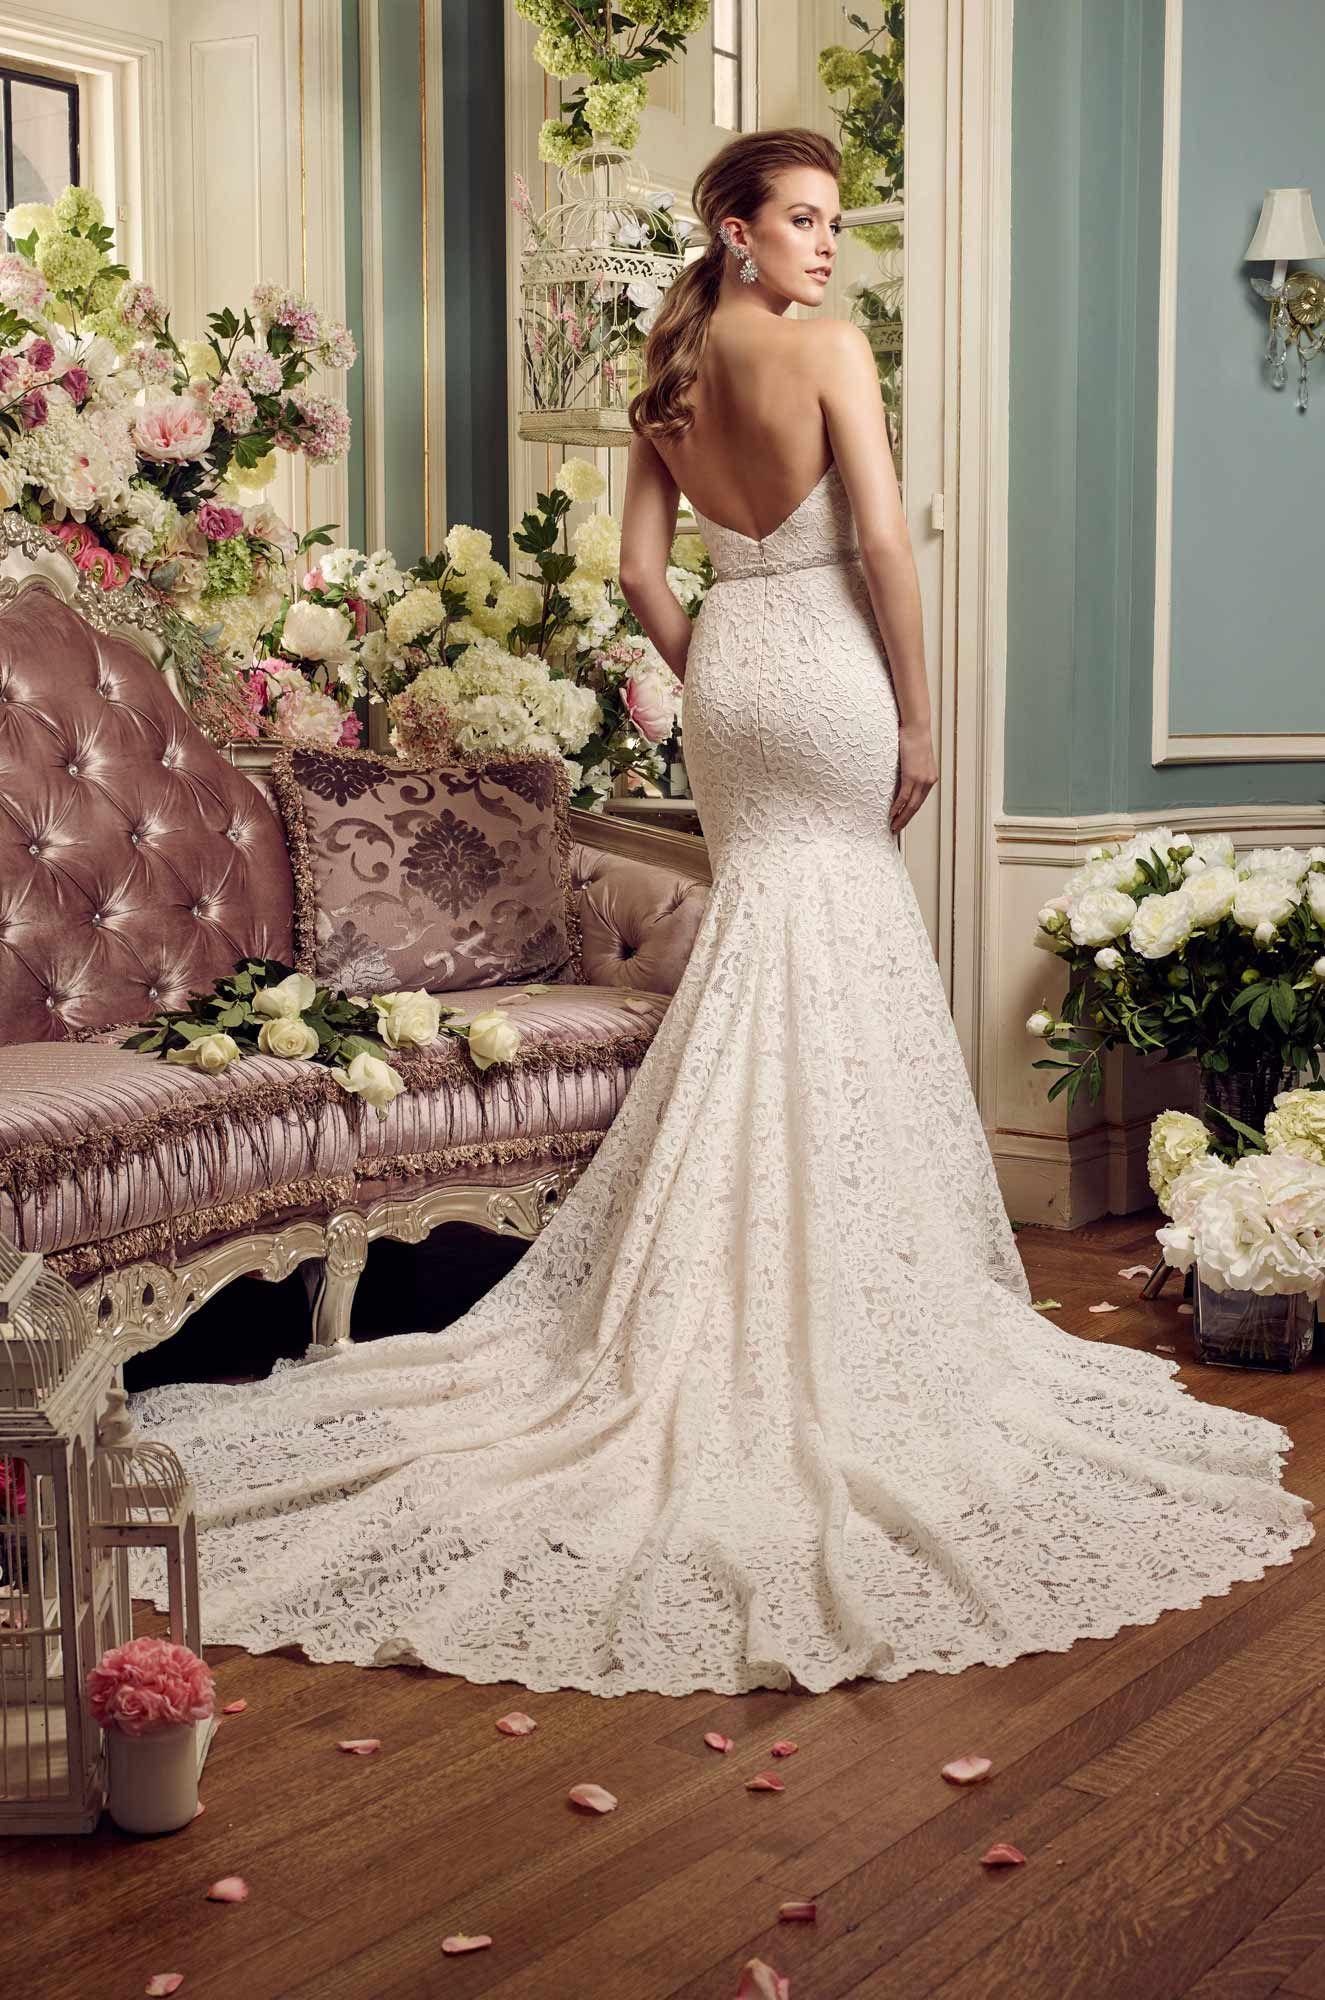 Strapless Lace Wedding Dress Style 2165 Mikaella Bridal